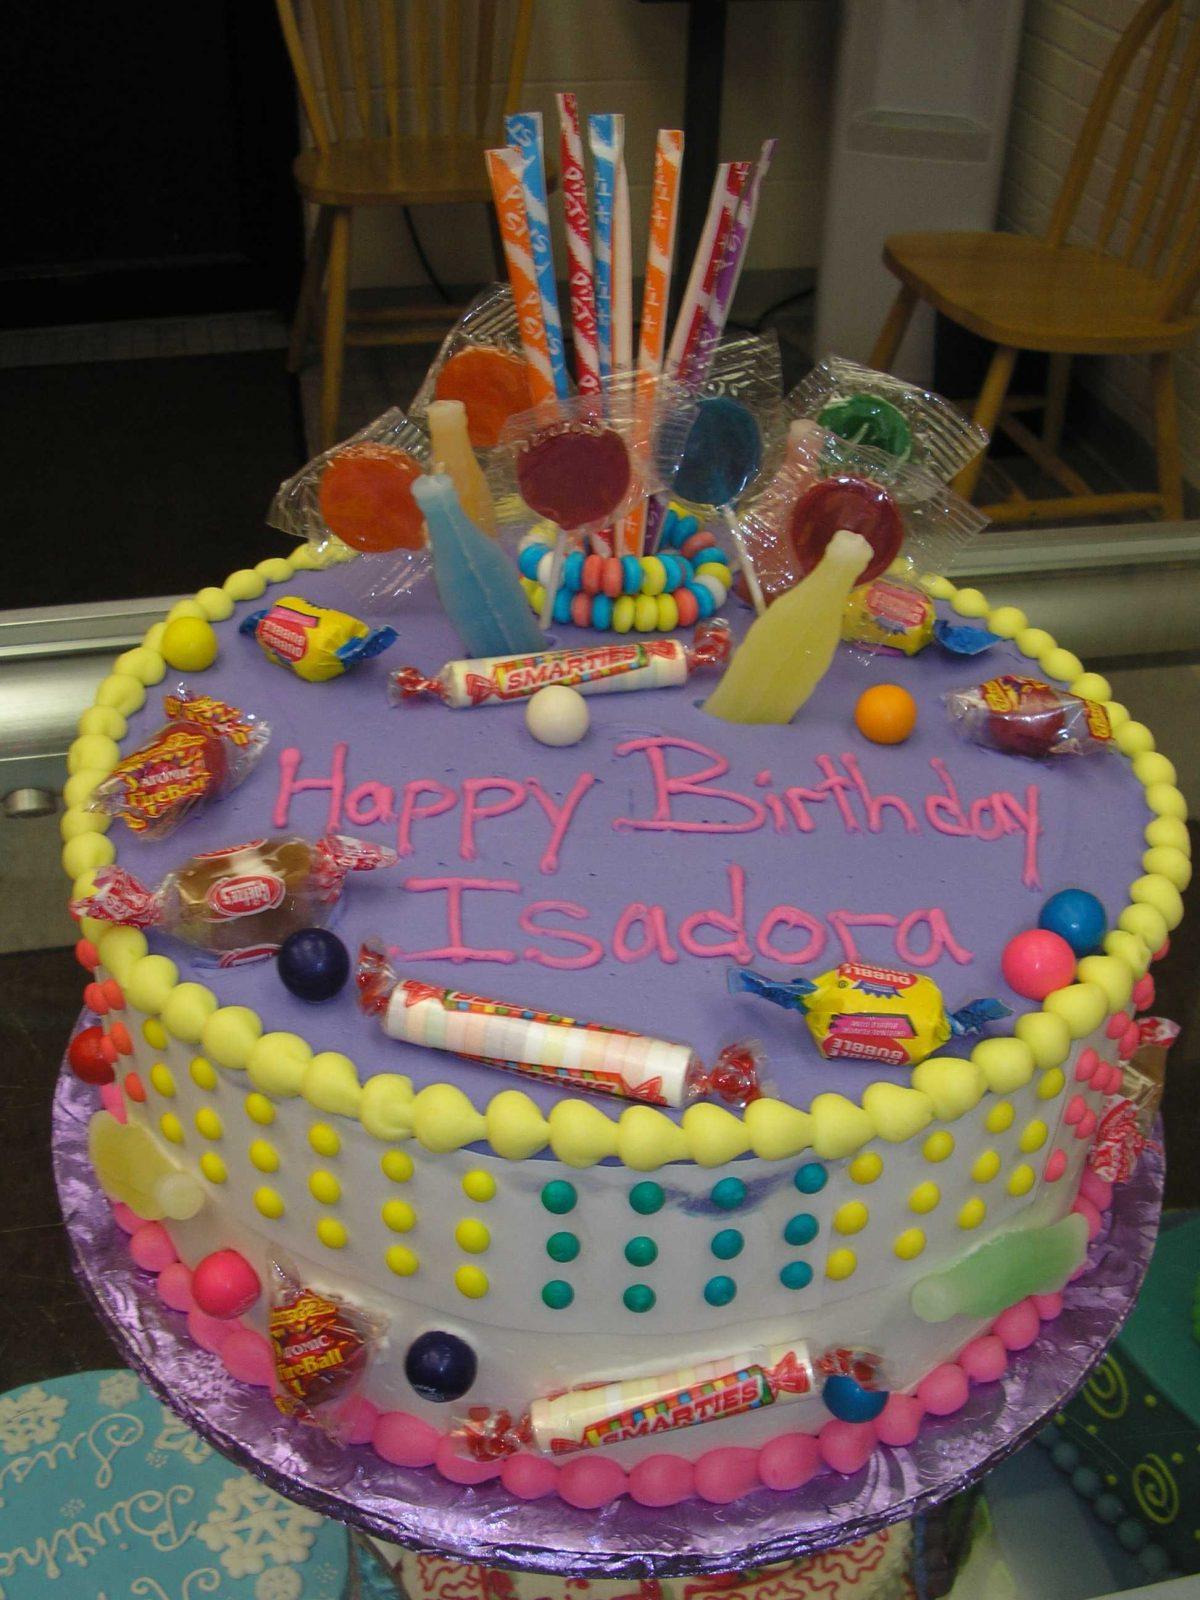 penny candy design cake, smartees. gumballs, lollipops